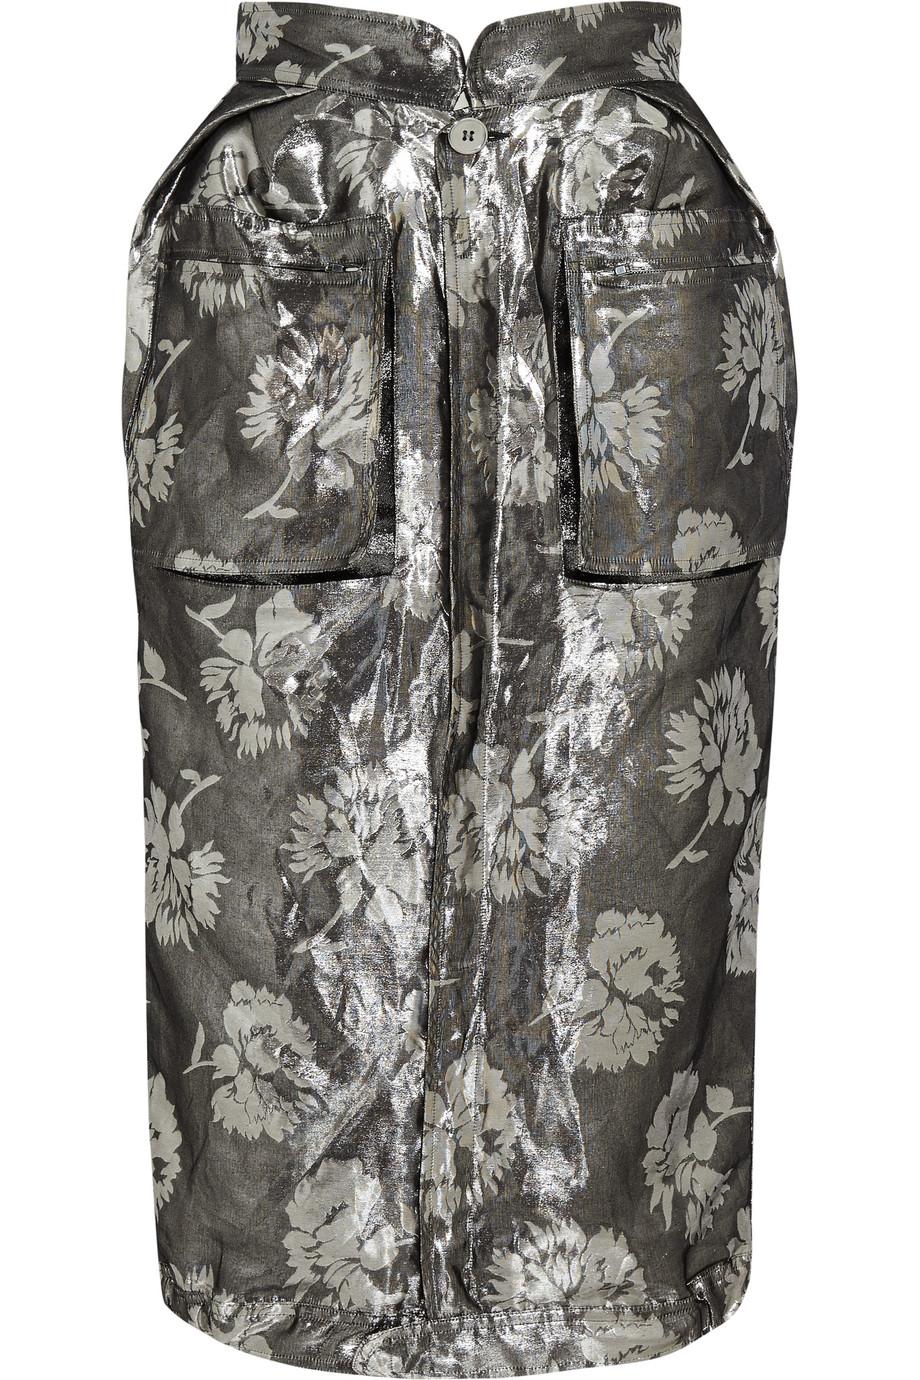 Maison Margiela Metallic Jacquard Skirt, Silver/Metallic, Women's, Size: 40